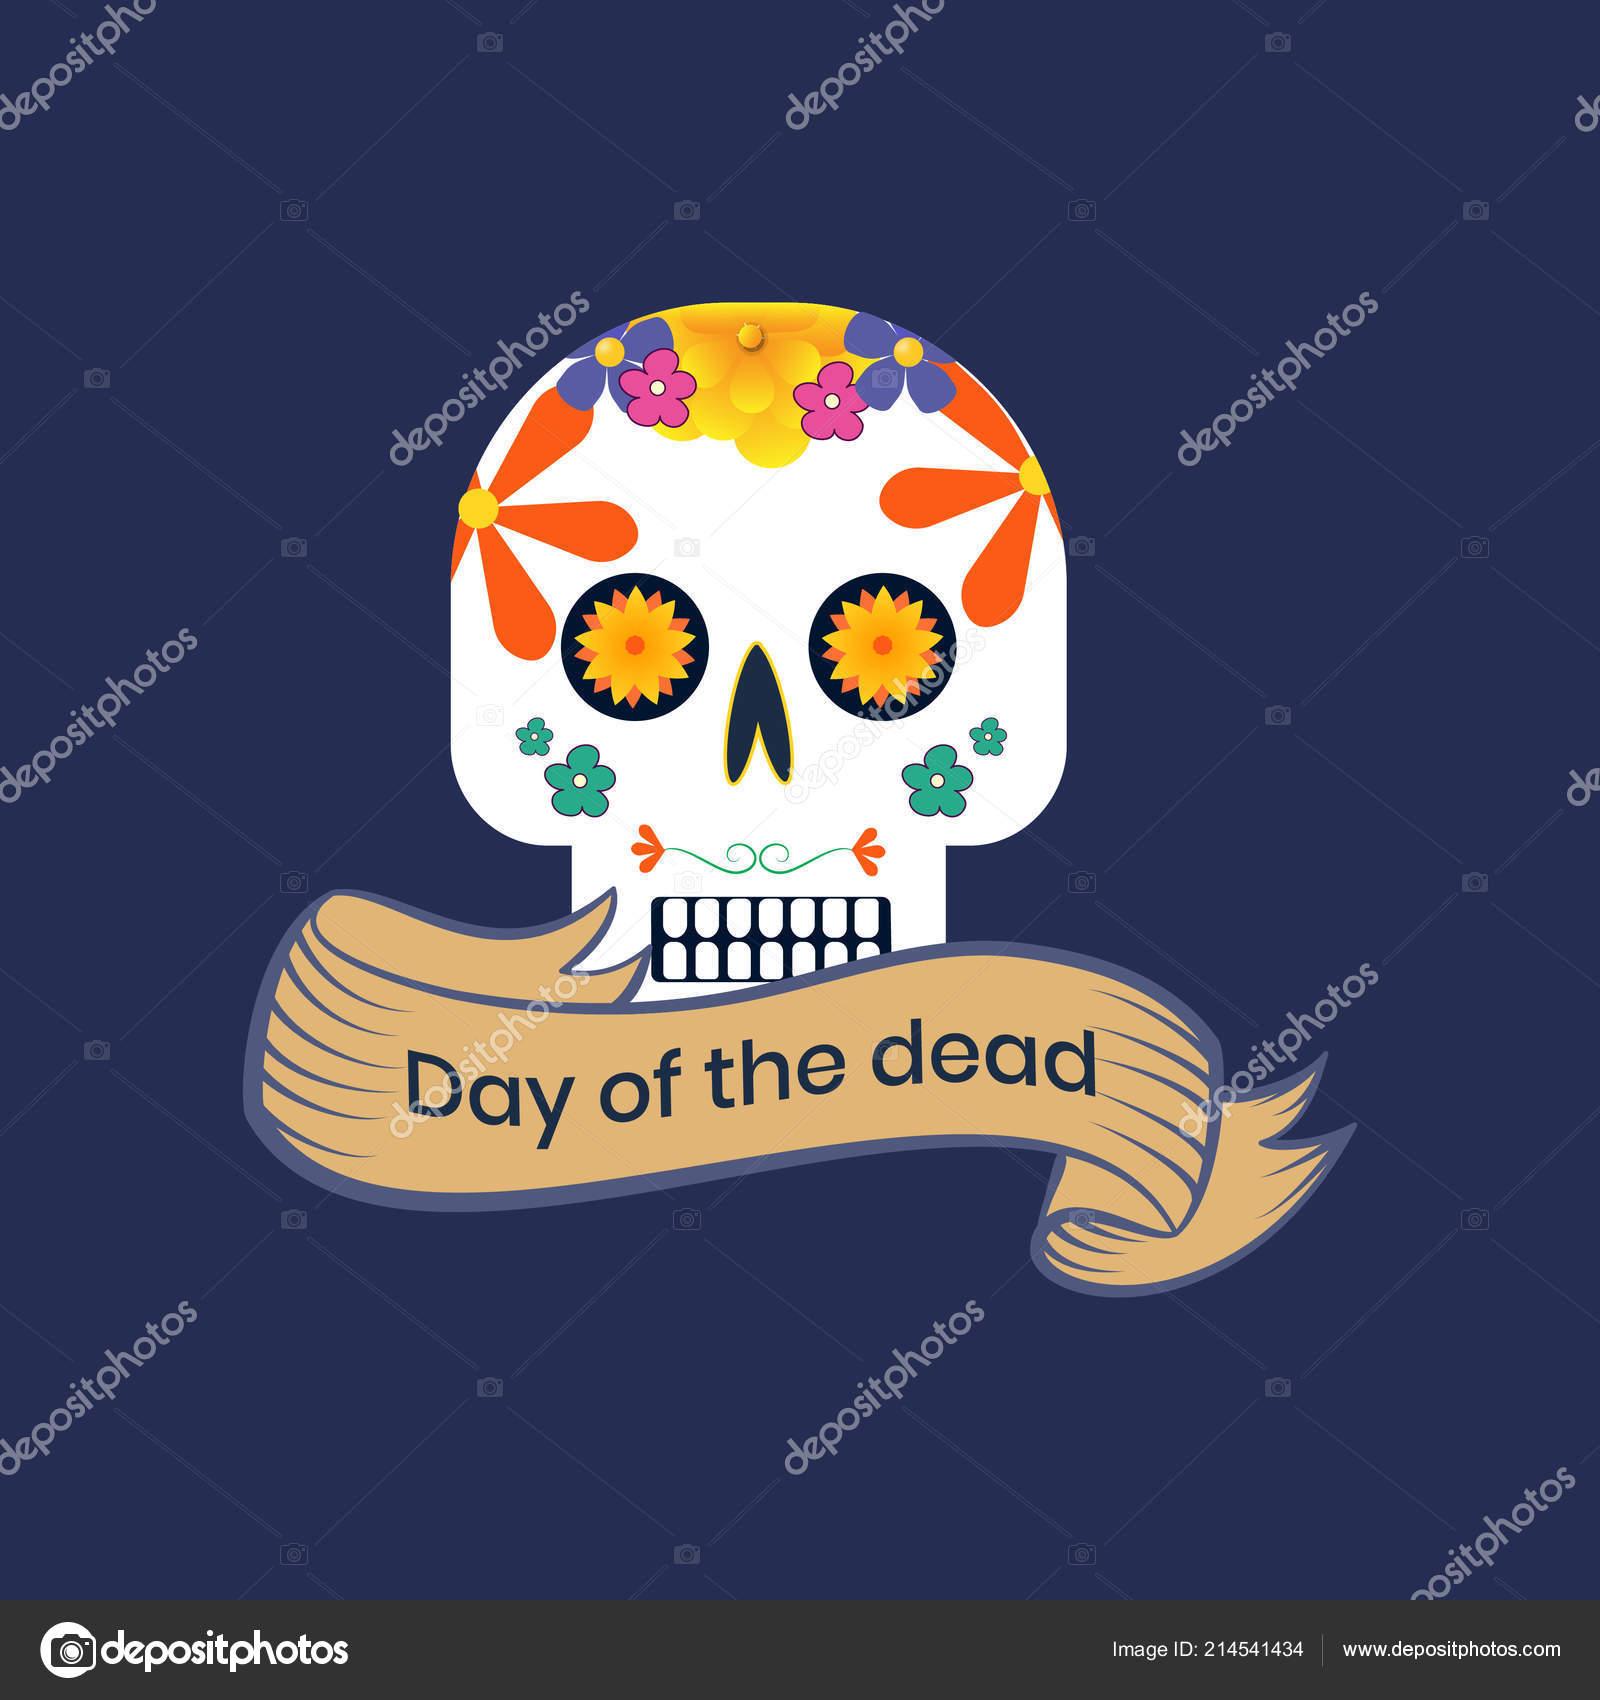 Colorful Maxican Sugar Skull Design Poster Wallpaper Flyer Stock Vector